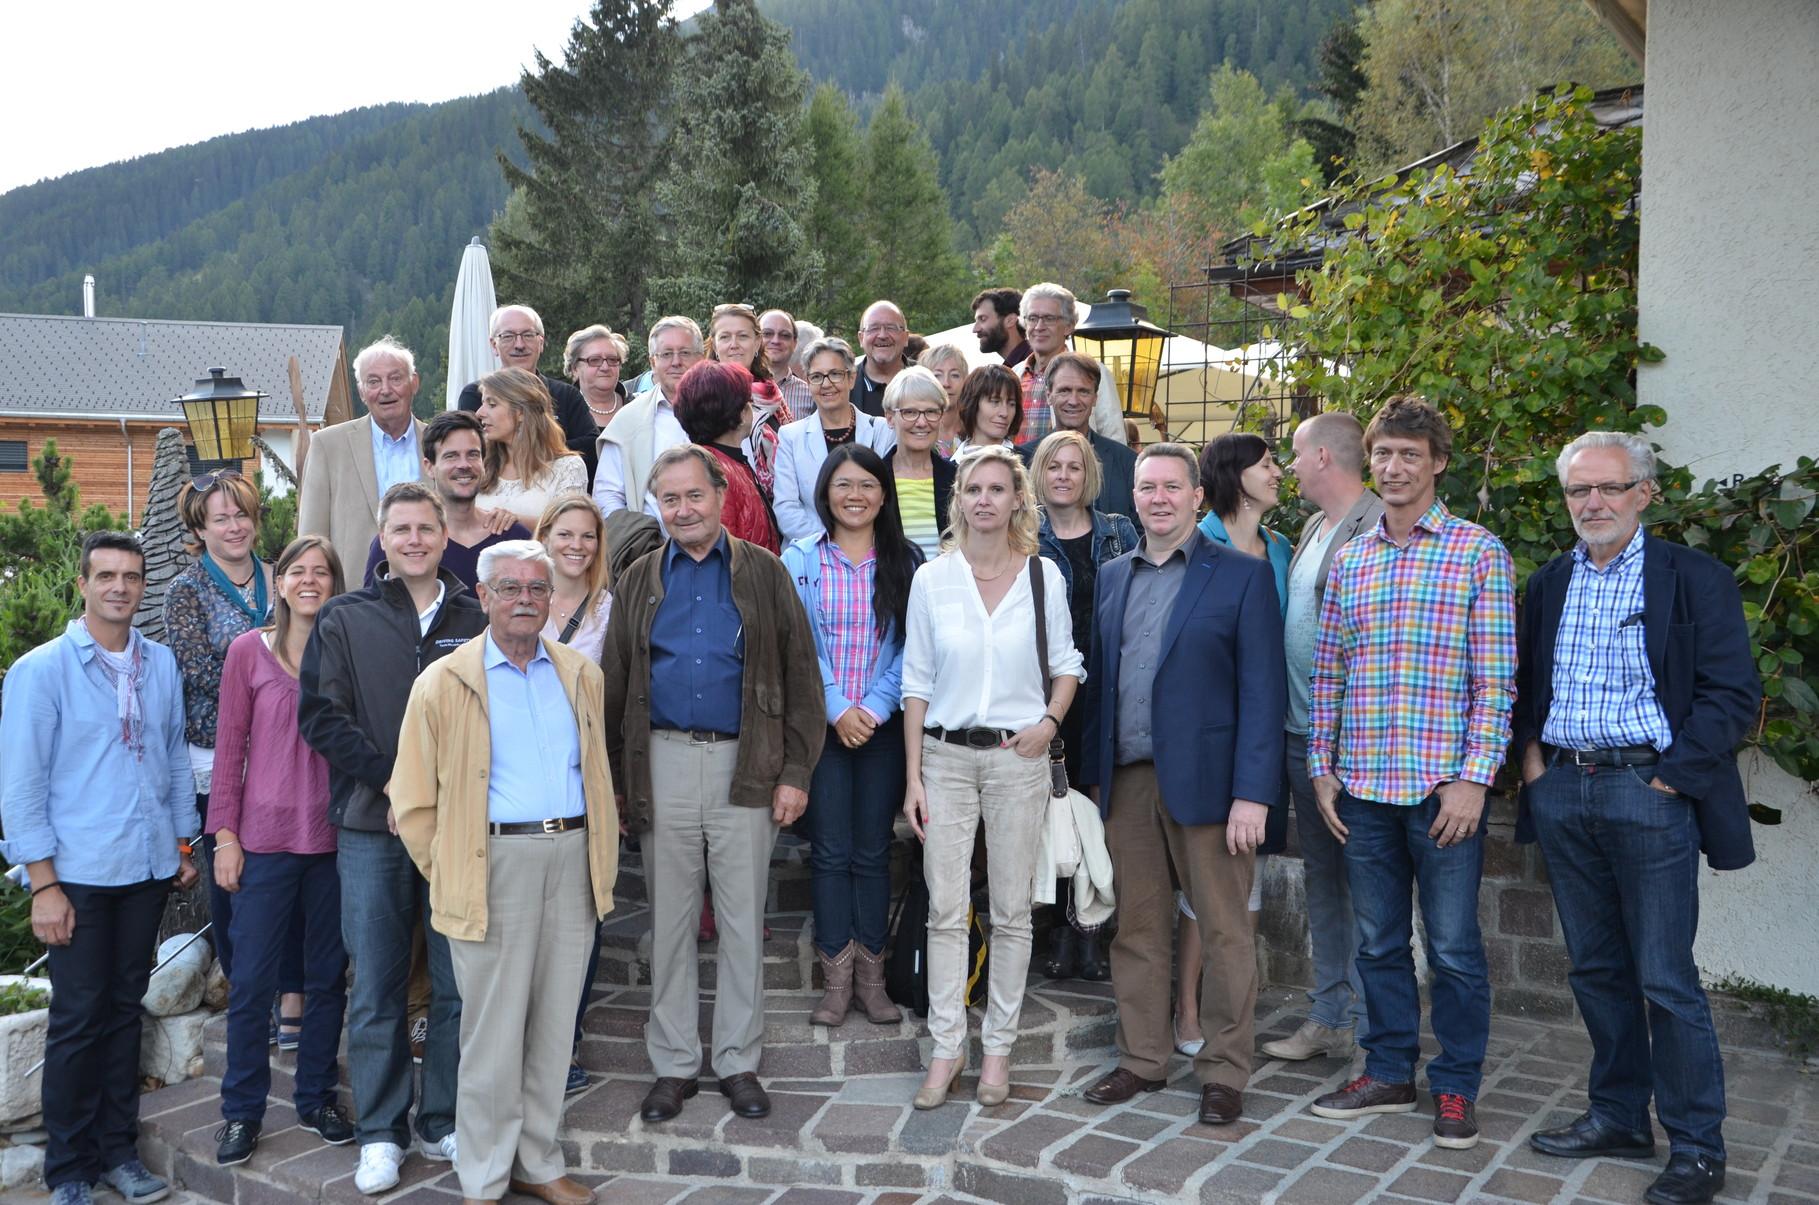 Jubiläumsgesellschaft zum Jubiläum 50 Jahre OVB, 6. September 2014